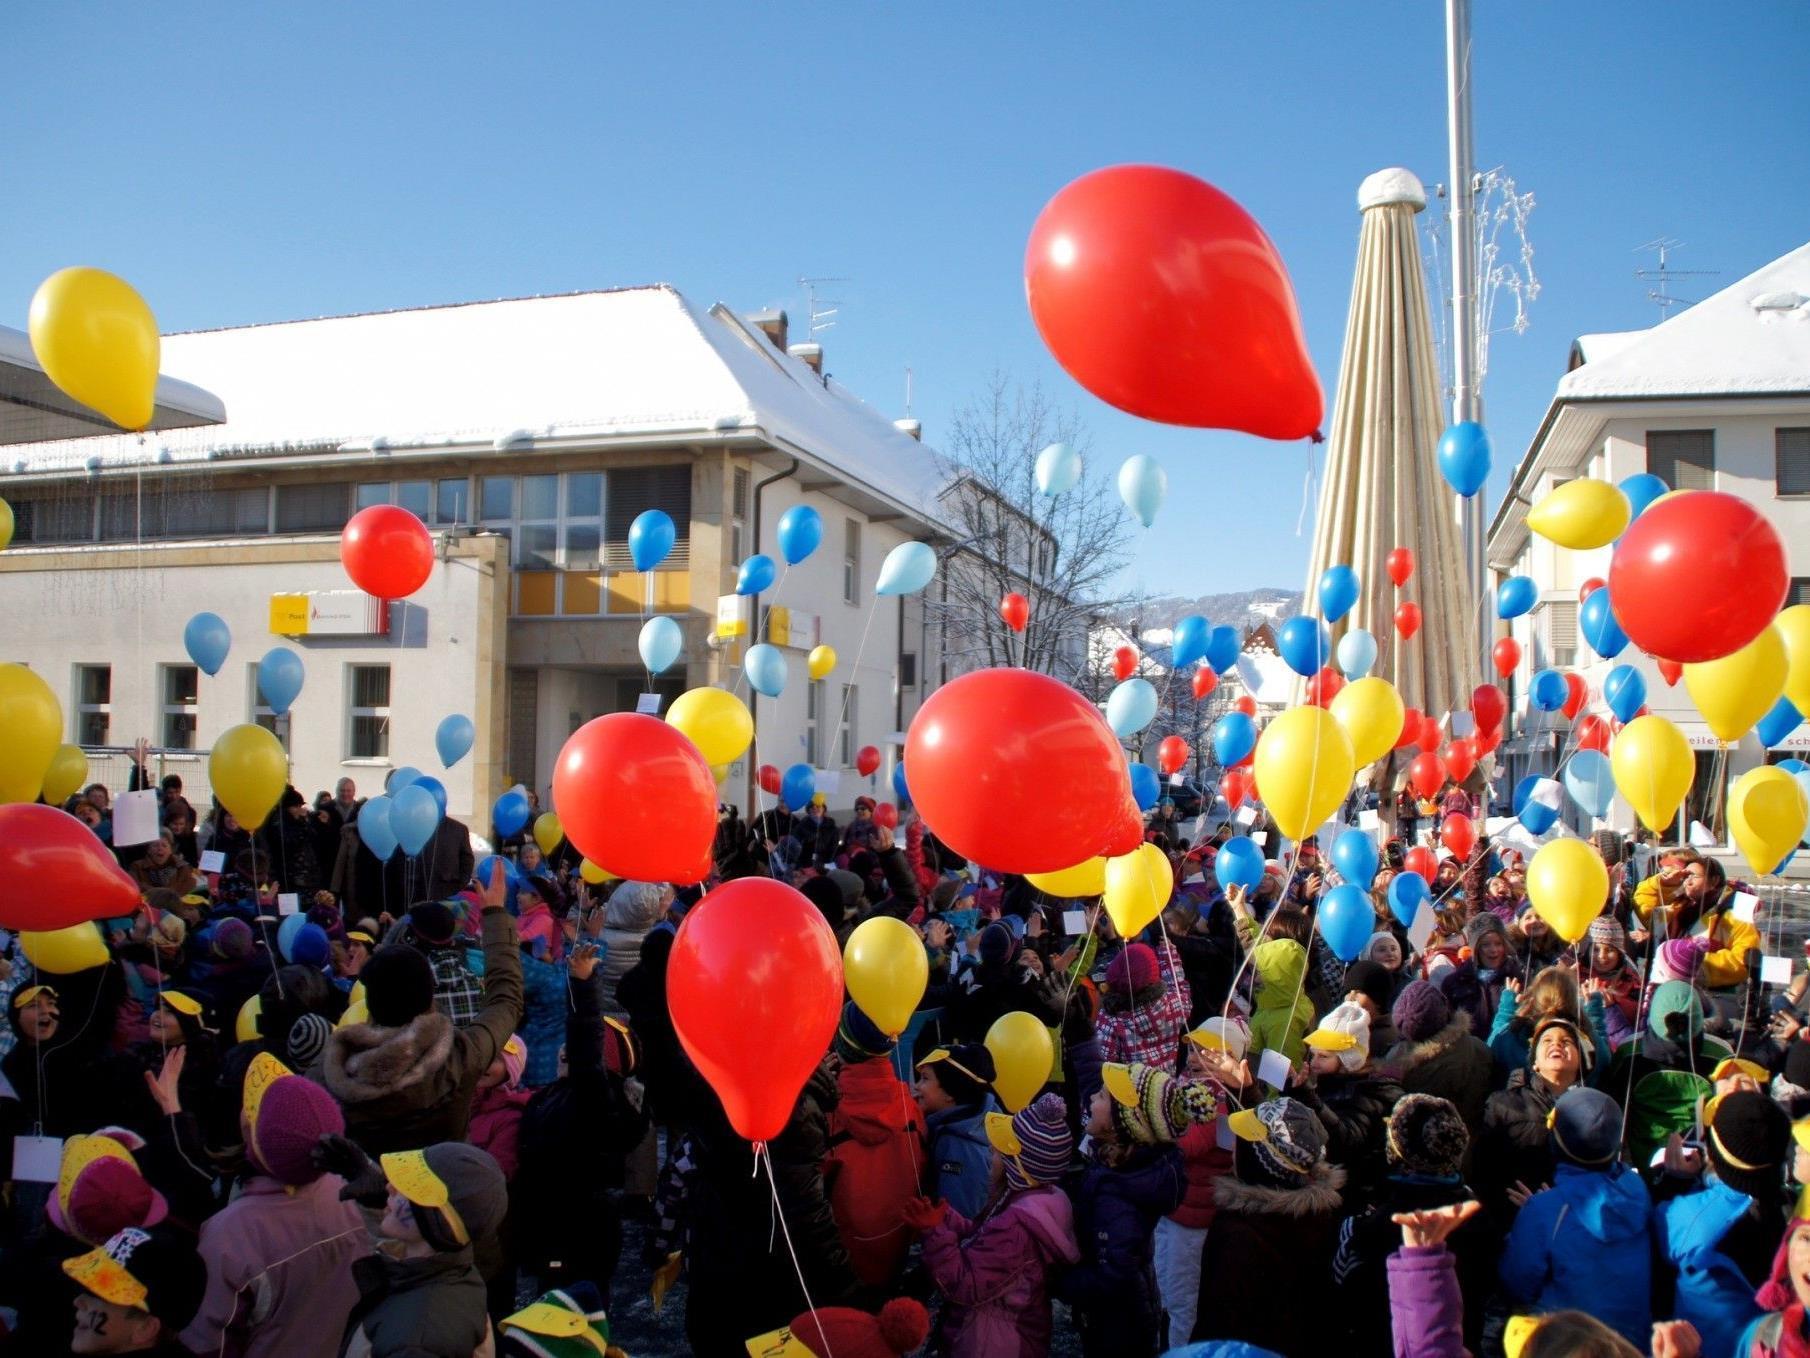 Flashmob mit 200 Schülern samt Luftballons auf dem Kirchplatz